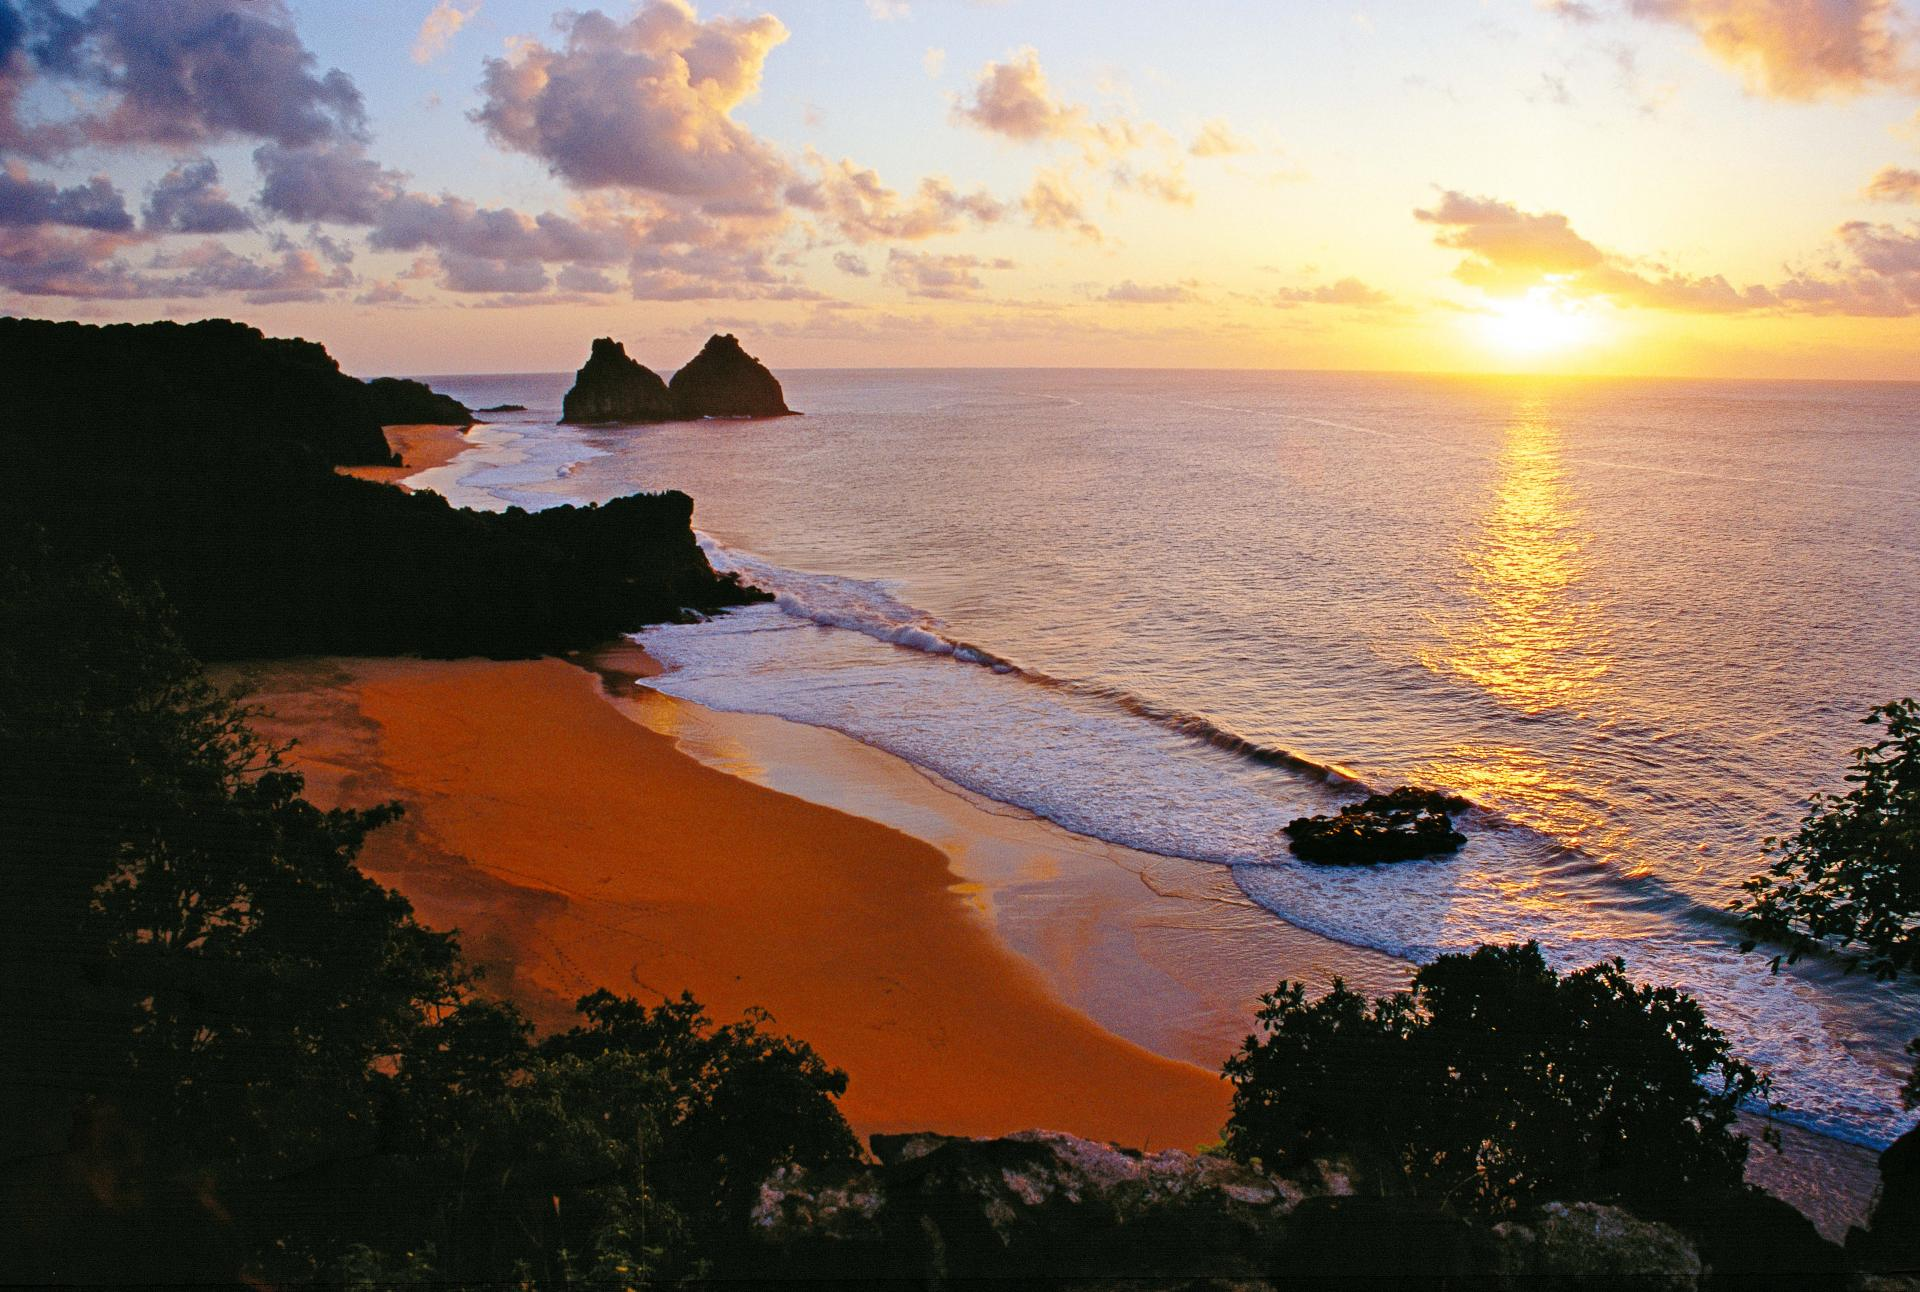 Sonnenuntergang auf der romantischen Insel Fernando de Noronha